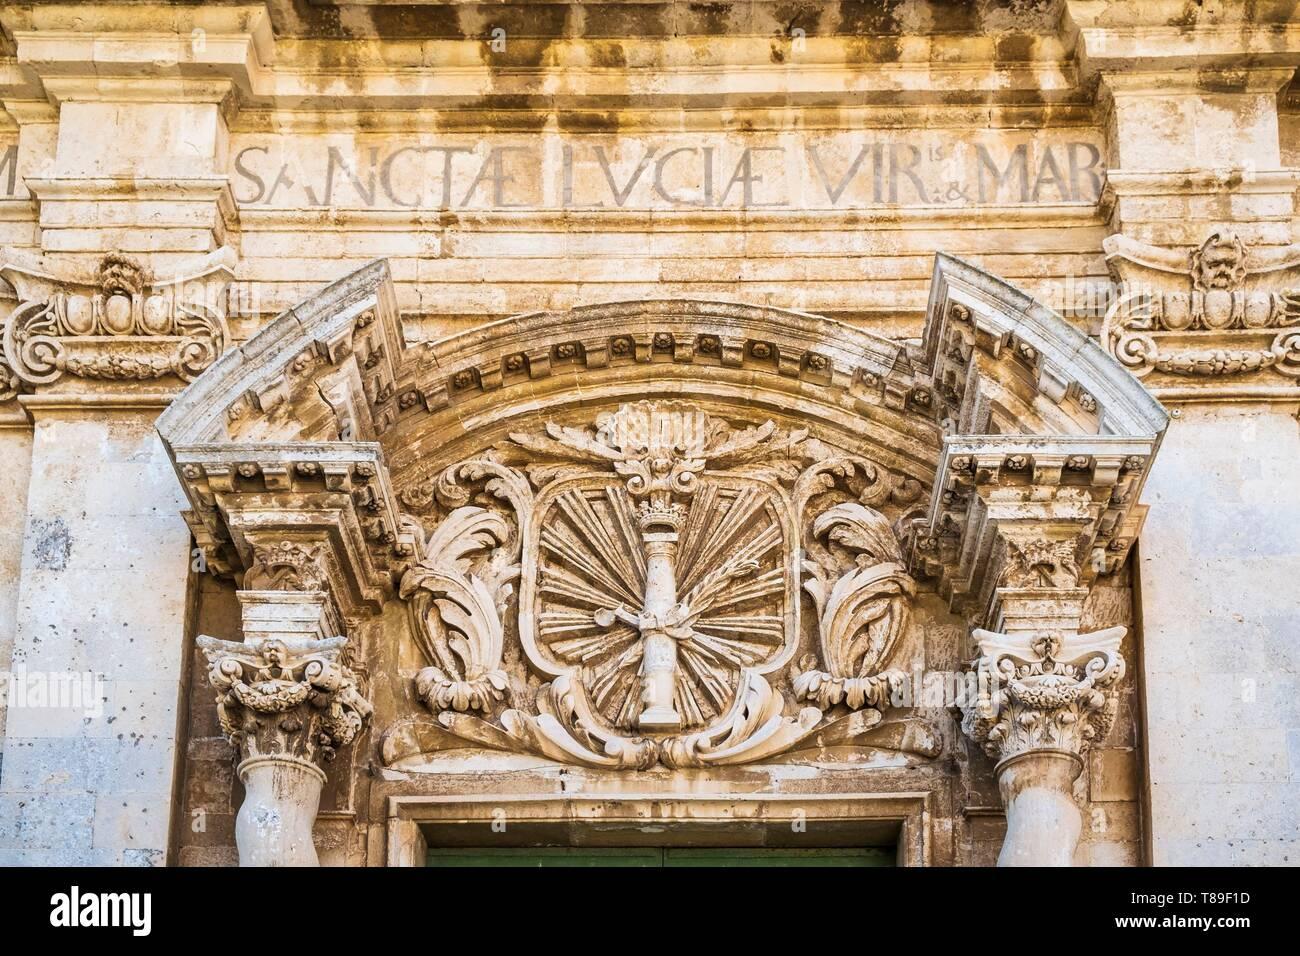 Italy, Sicily, Syracuse, the historical centre on Ortigia island, UNESCO World Heritage site, Piazza Duomo, Santa Lucia alla Badia church - Stock Image